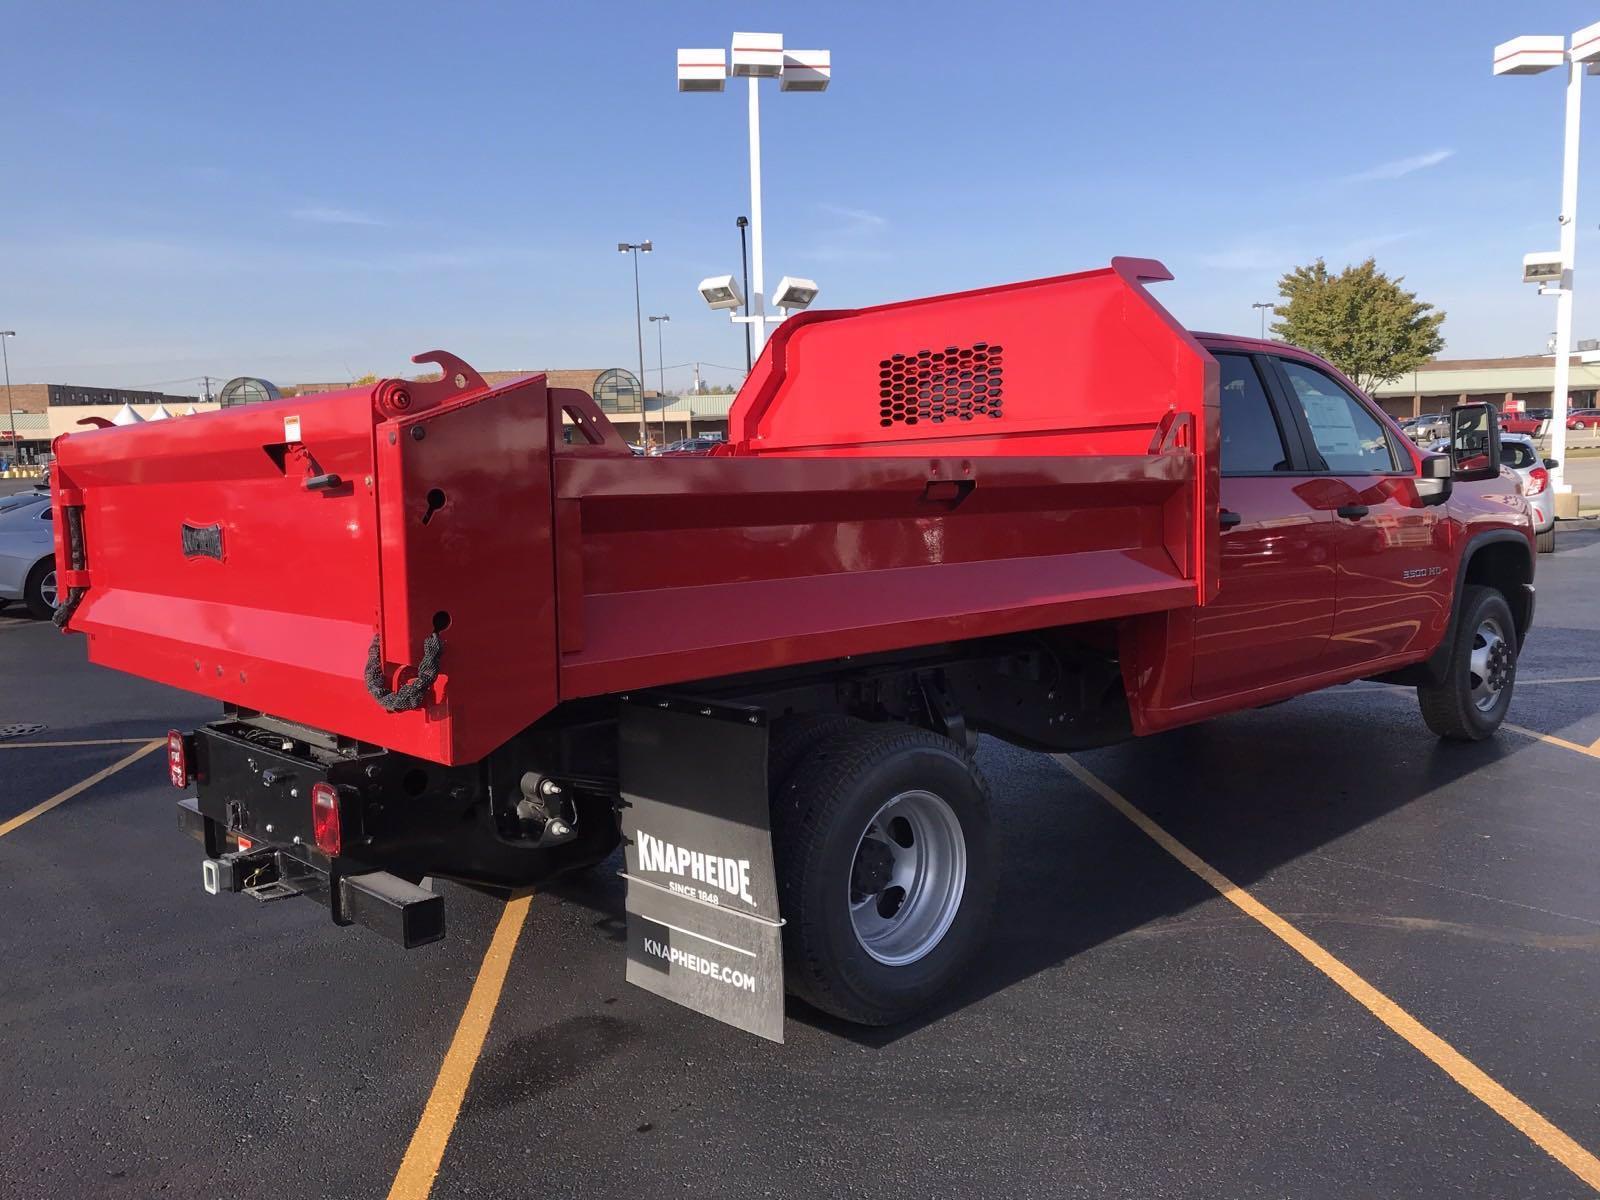 2020 Chevrolet Silverado 3500 Crew Cab DRW 4x2, Knapheide Dump Body #B27694 - photo 1